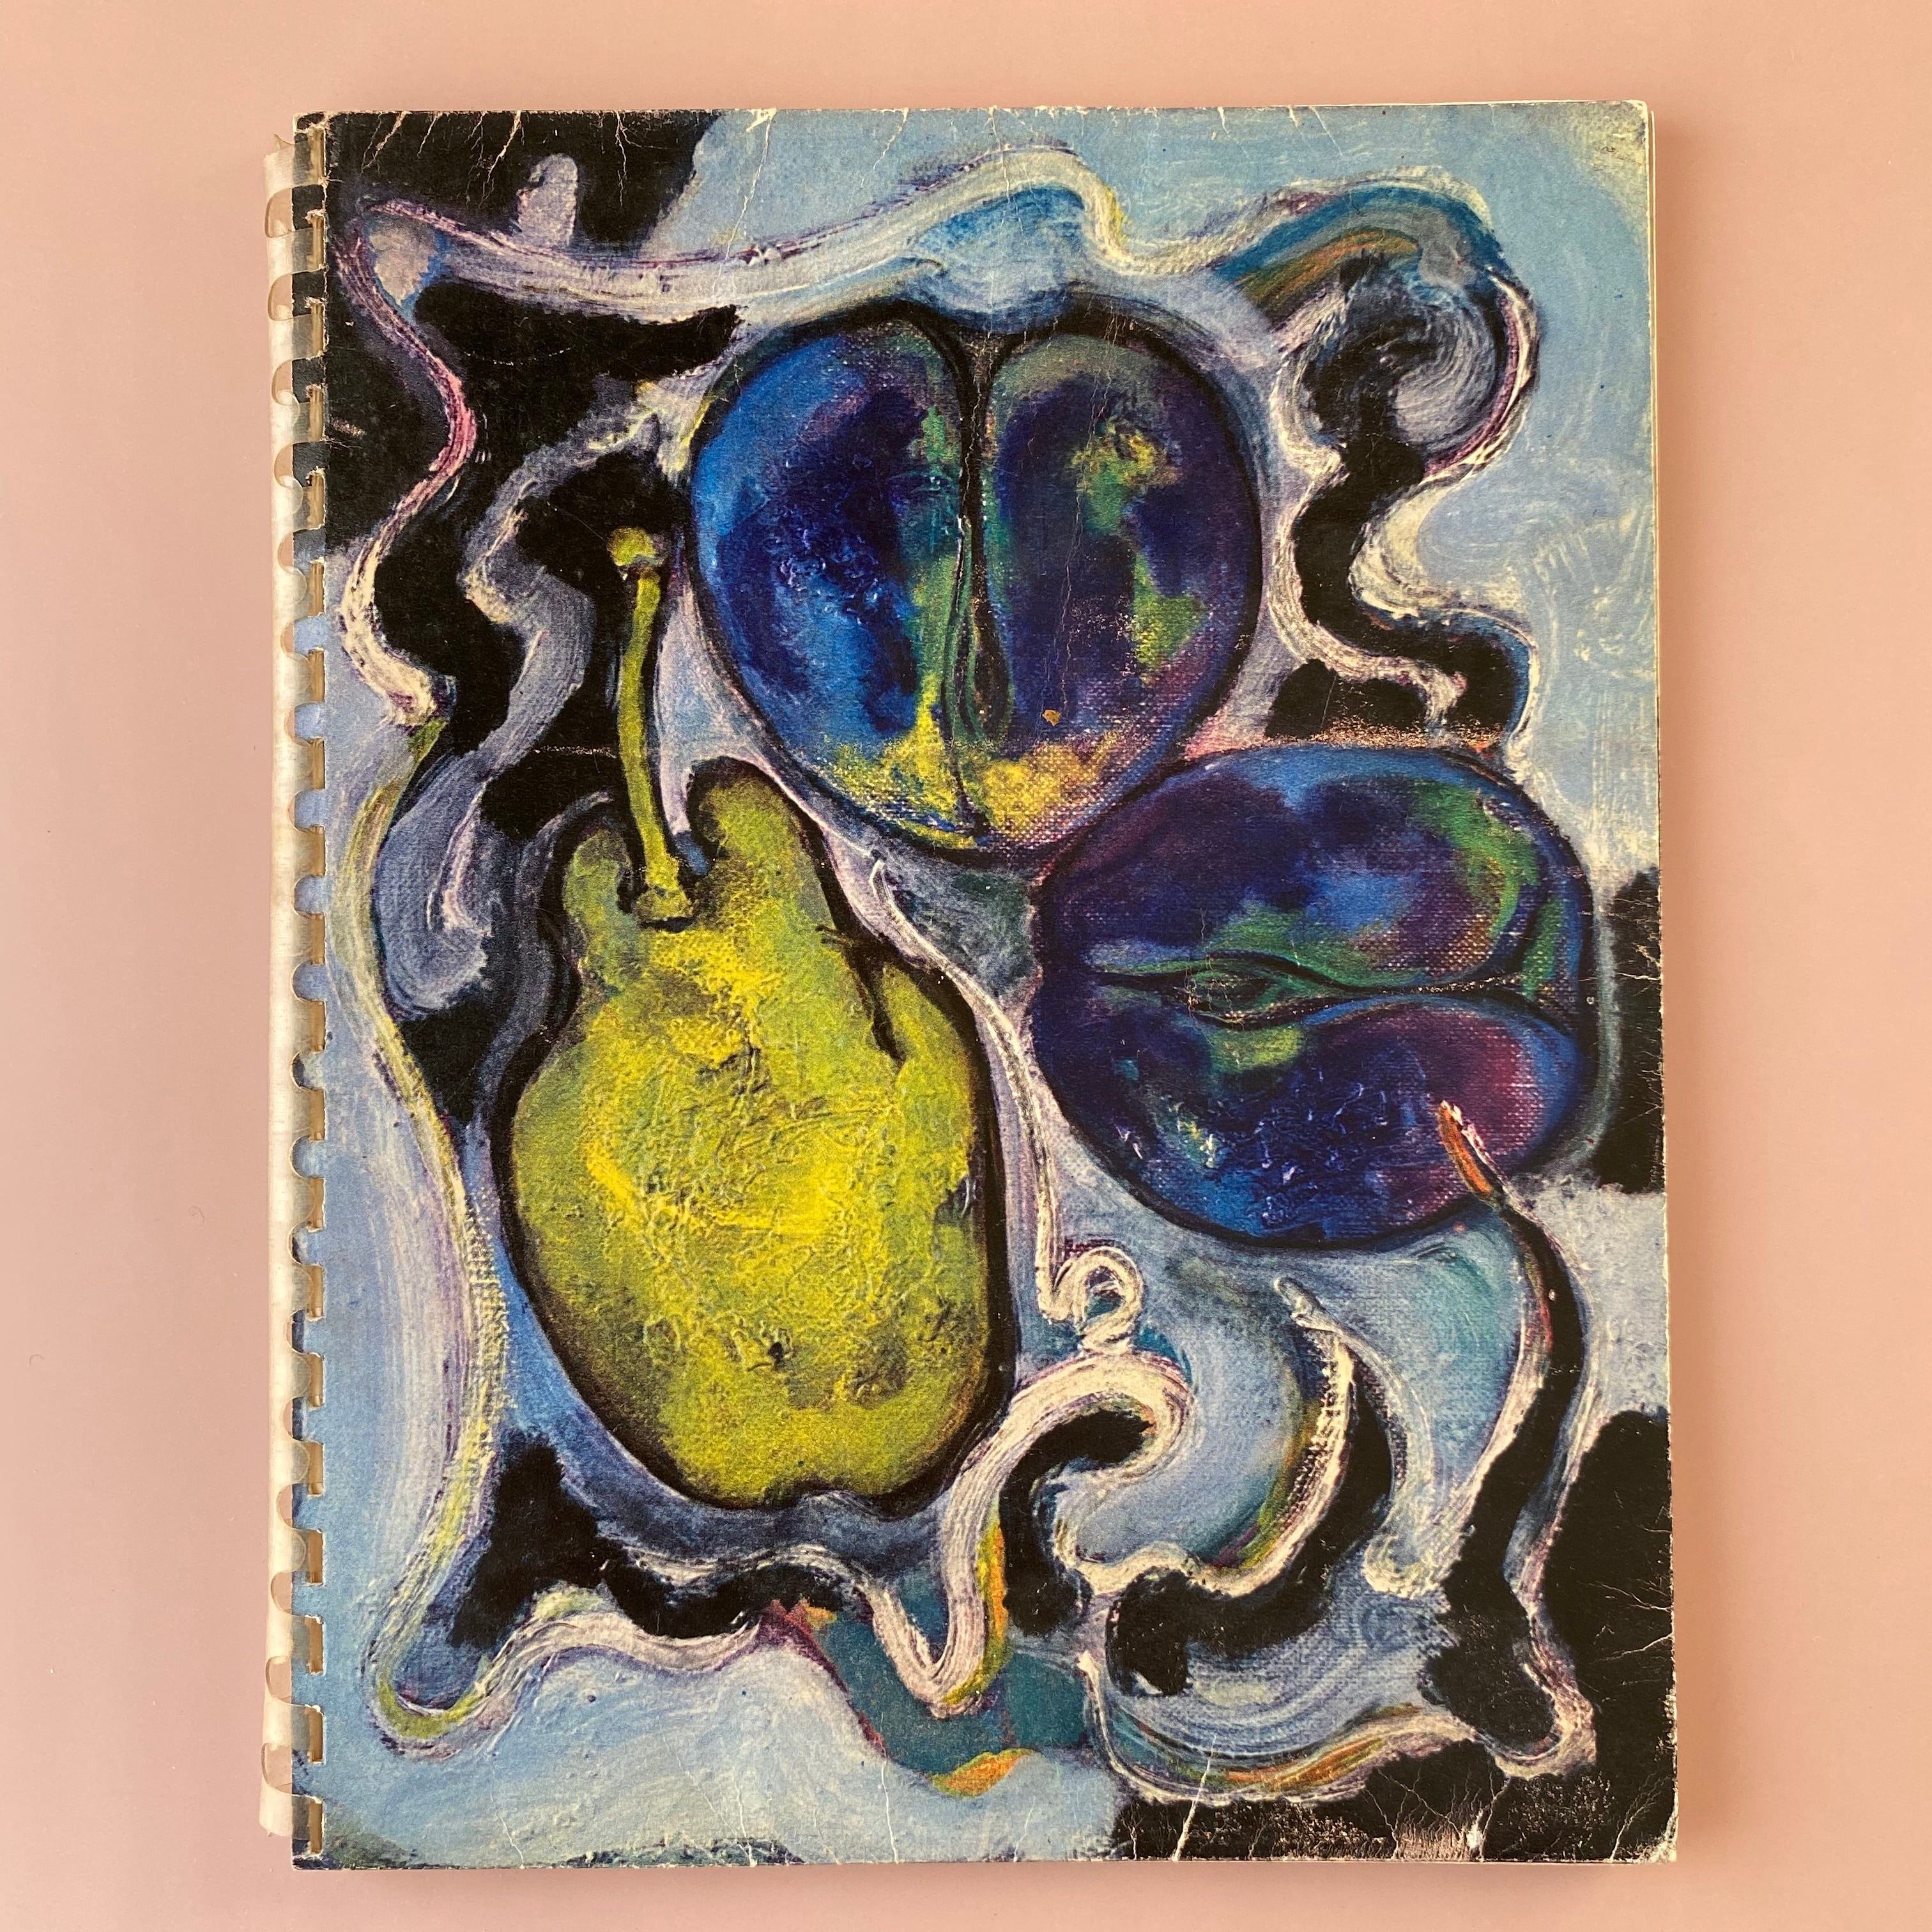 VINS NICOLAS CATALOGUE 1955・André Marchand / vp0094